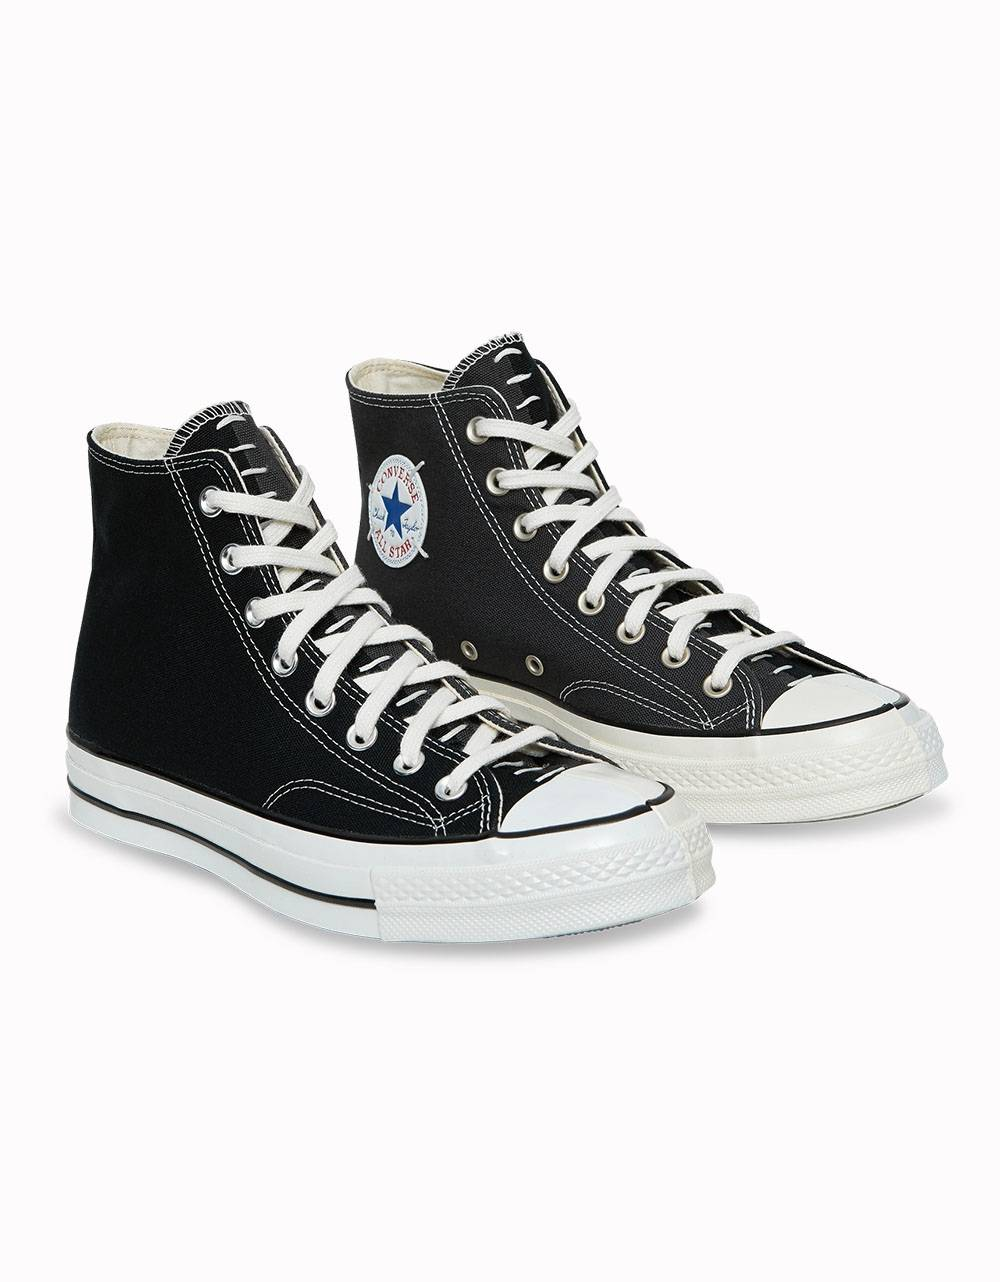 Converse Woman Chuck Taylor 70 Recostructed High ltd - black/almost black/egret Converse Sneakers 116,39€